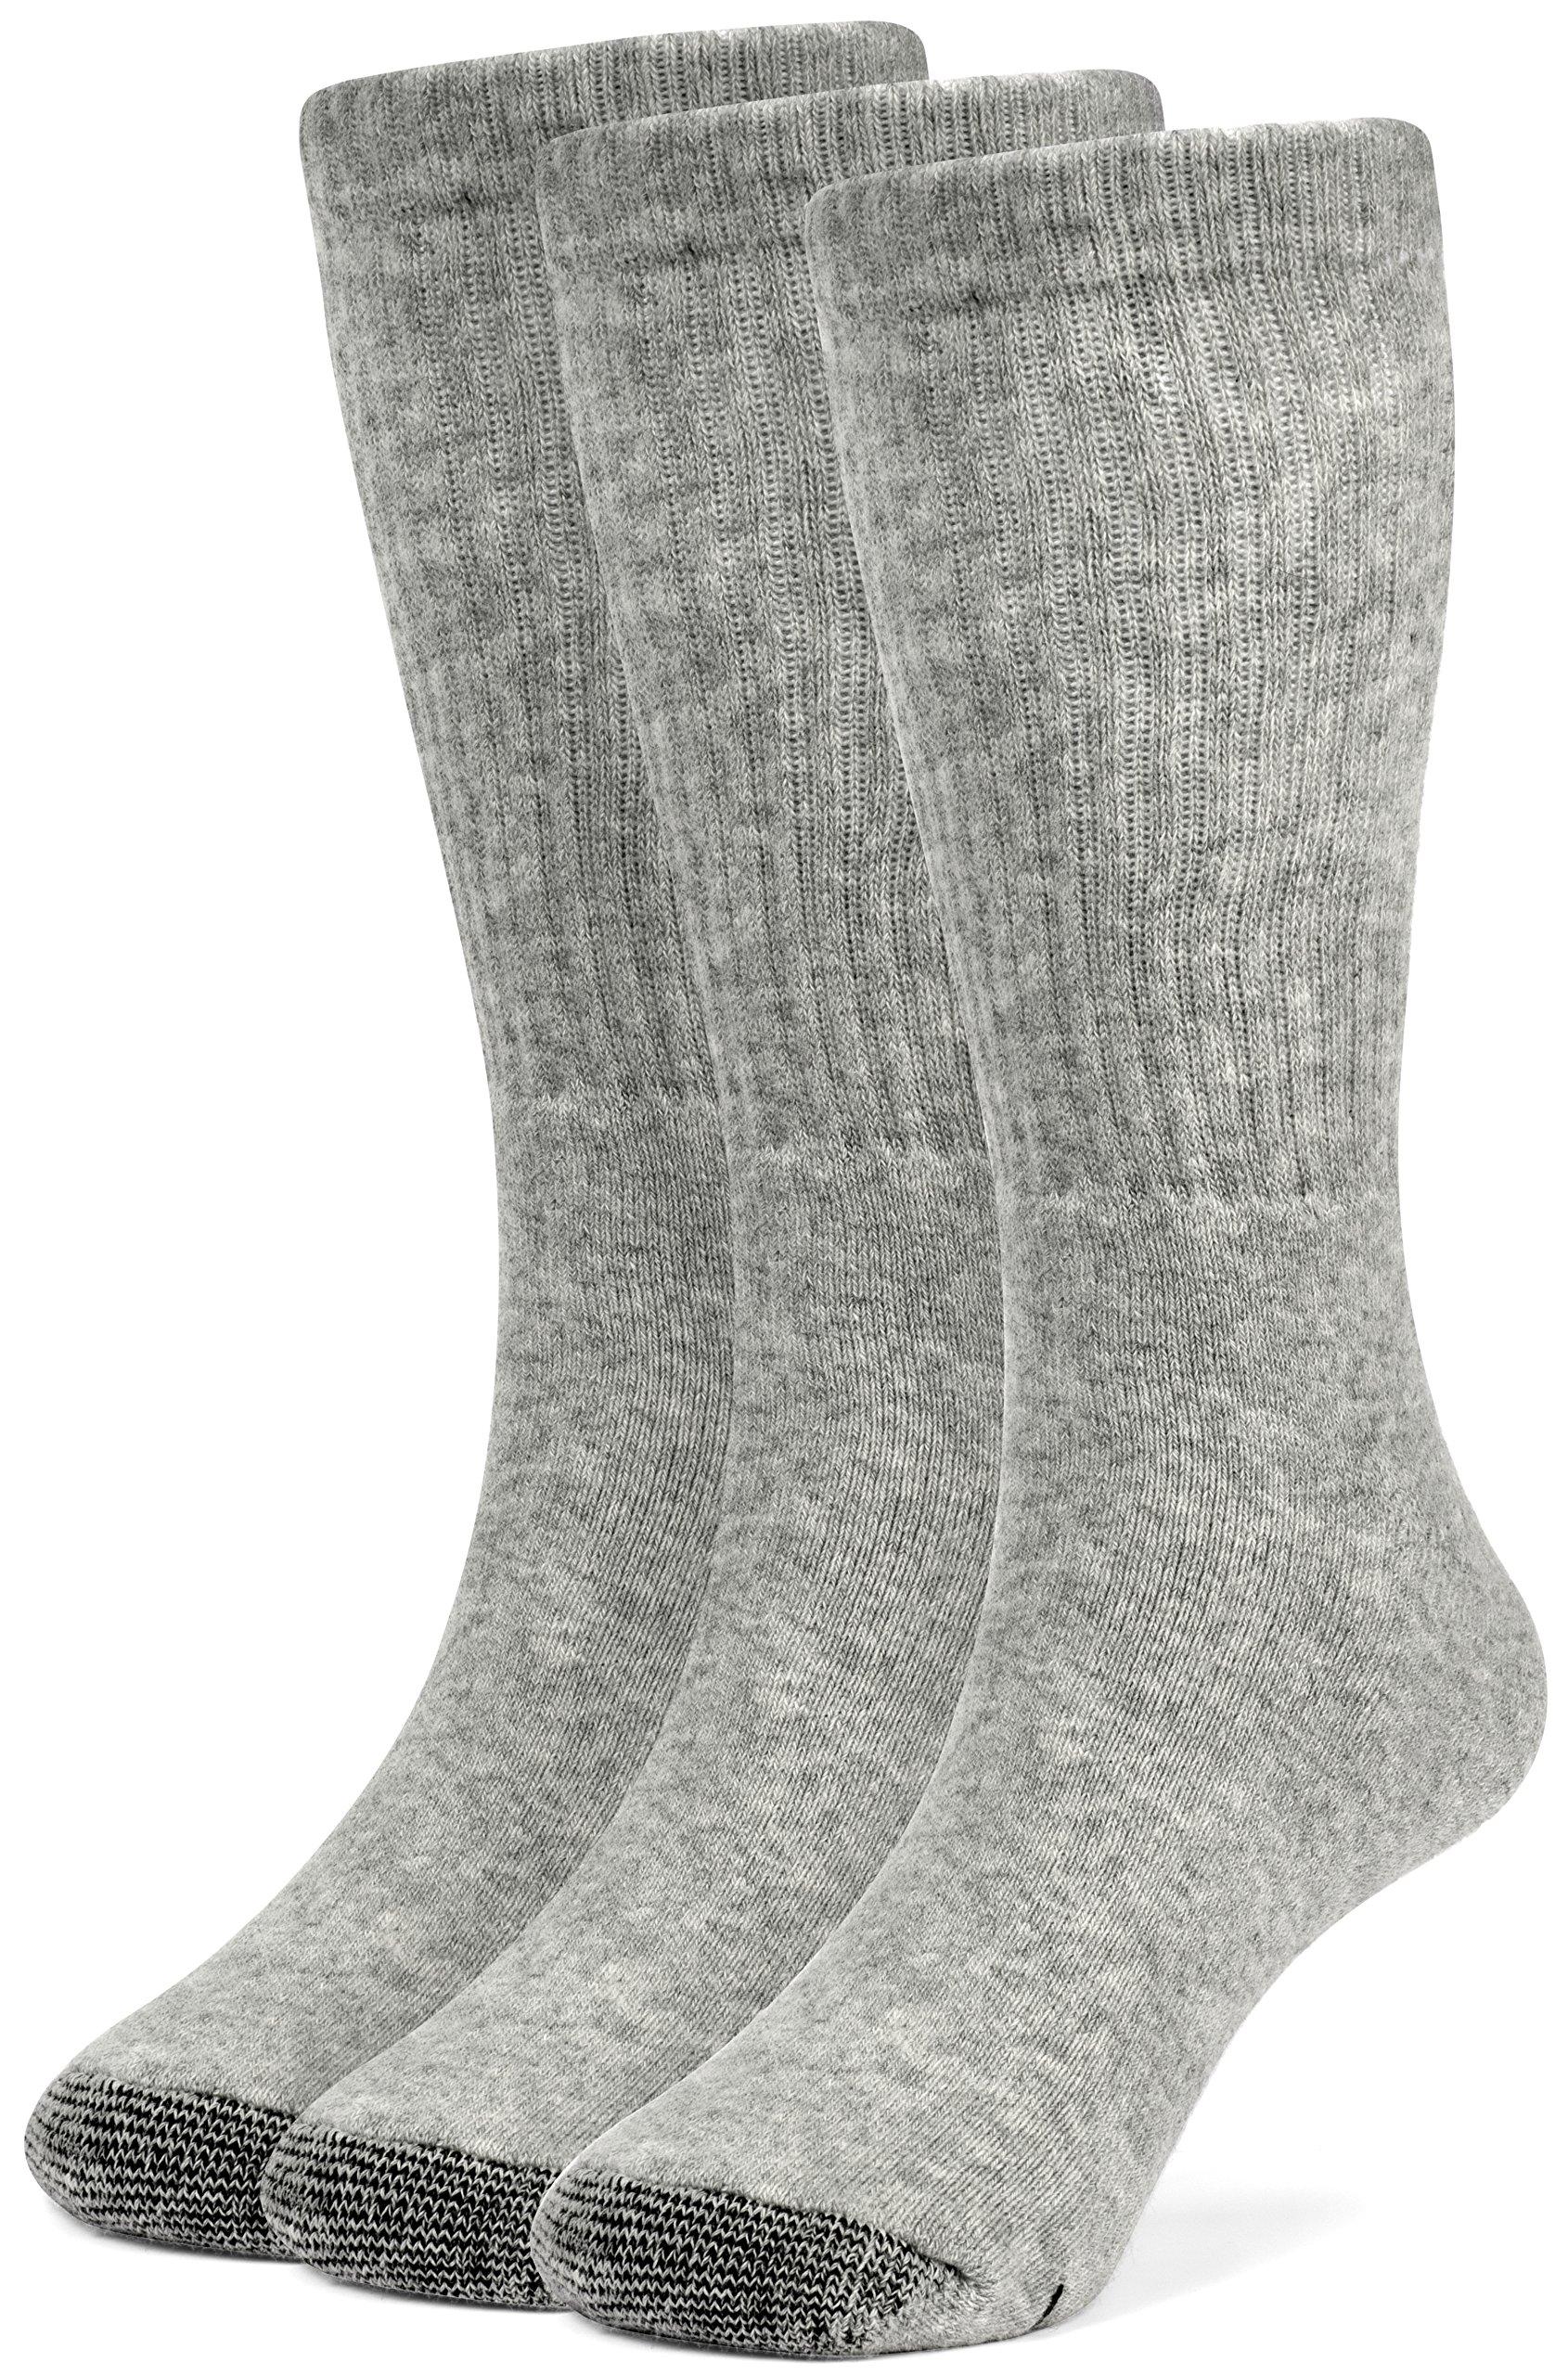 Galiva Boys' Cotton Extra Soft Crew Cushion Socks - 3 Pairs, Medium, Grey